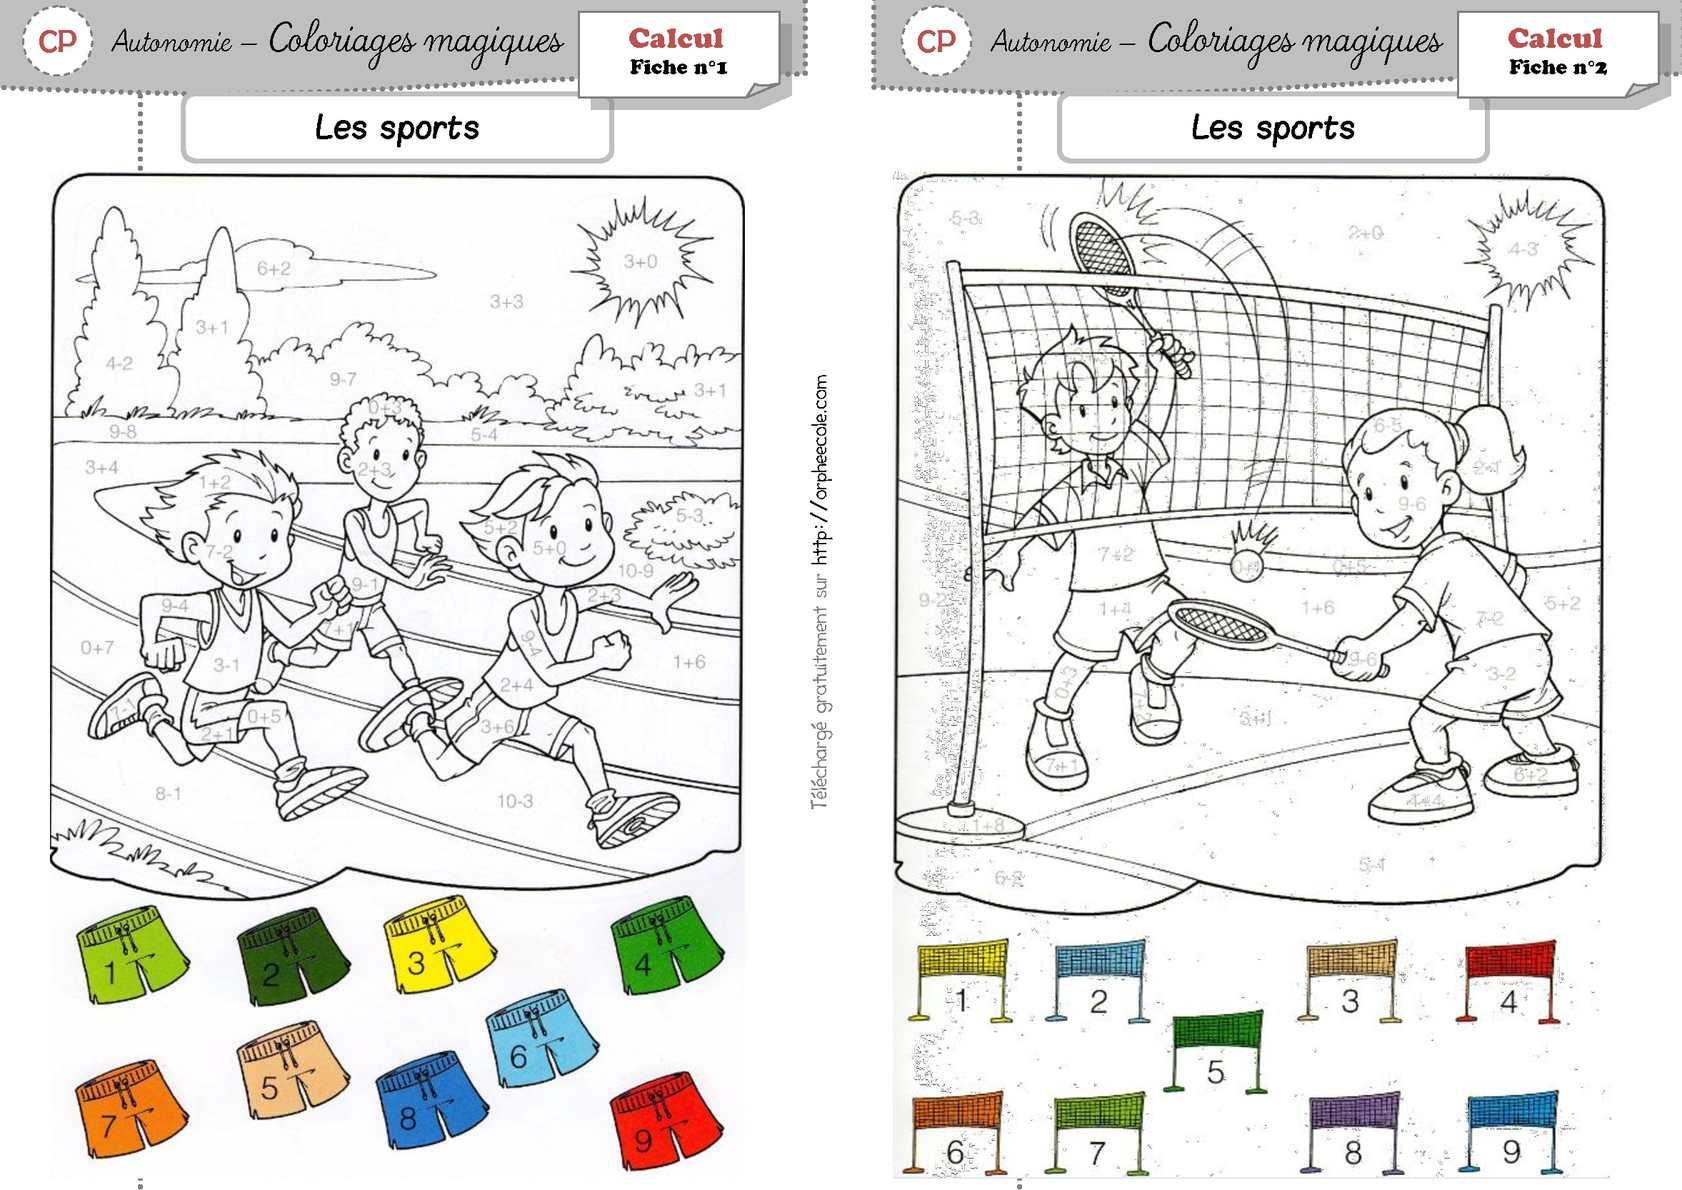 calamo coloriages magiques les sports - Coloriages Magiques